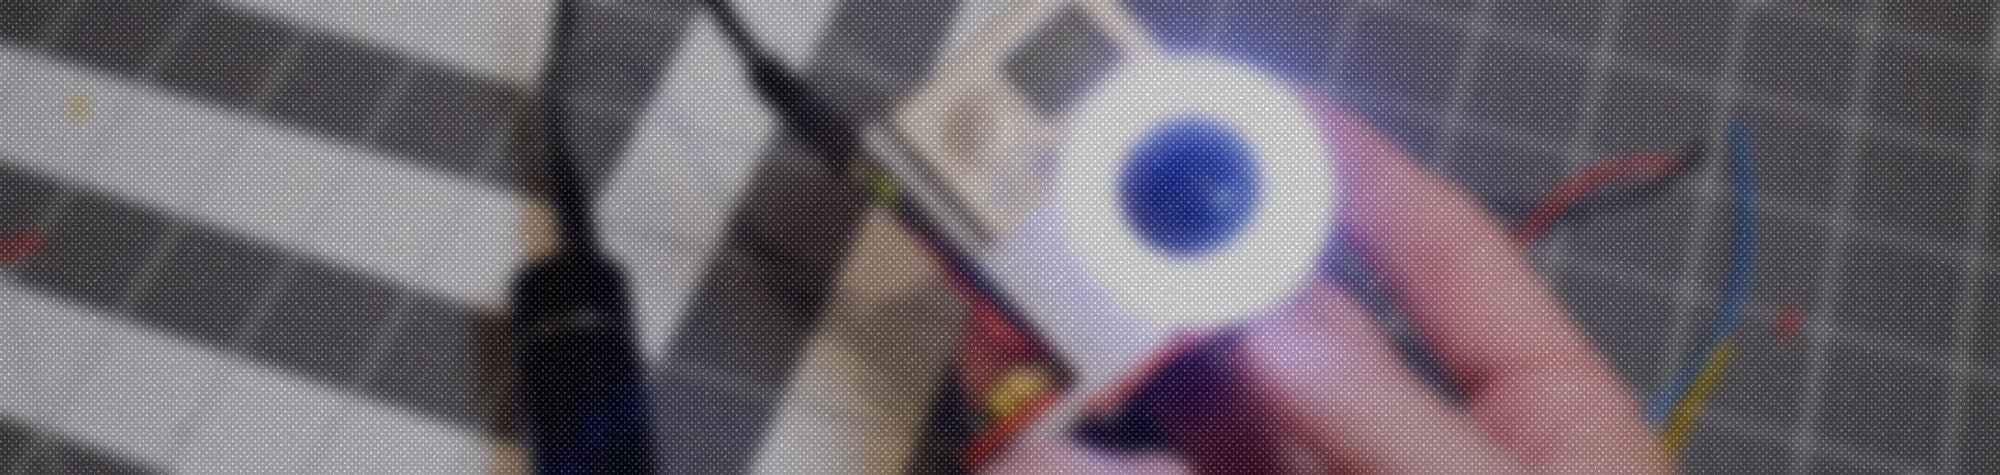 FOLLOW UP: GoPro ring light